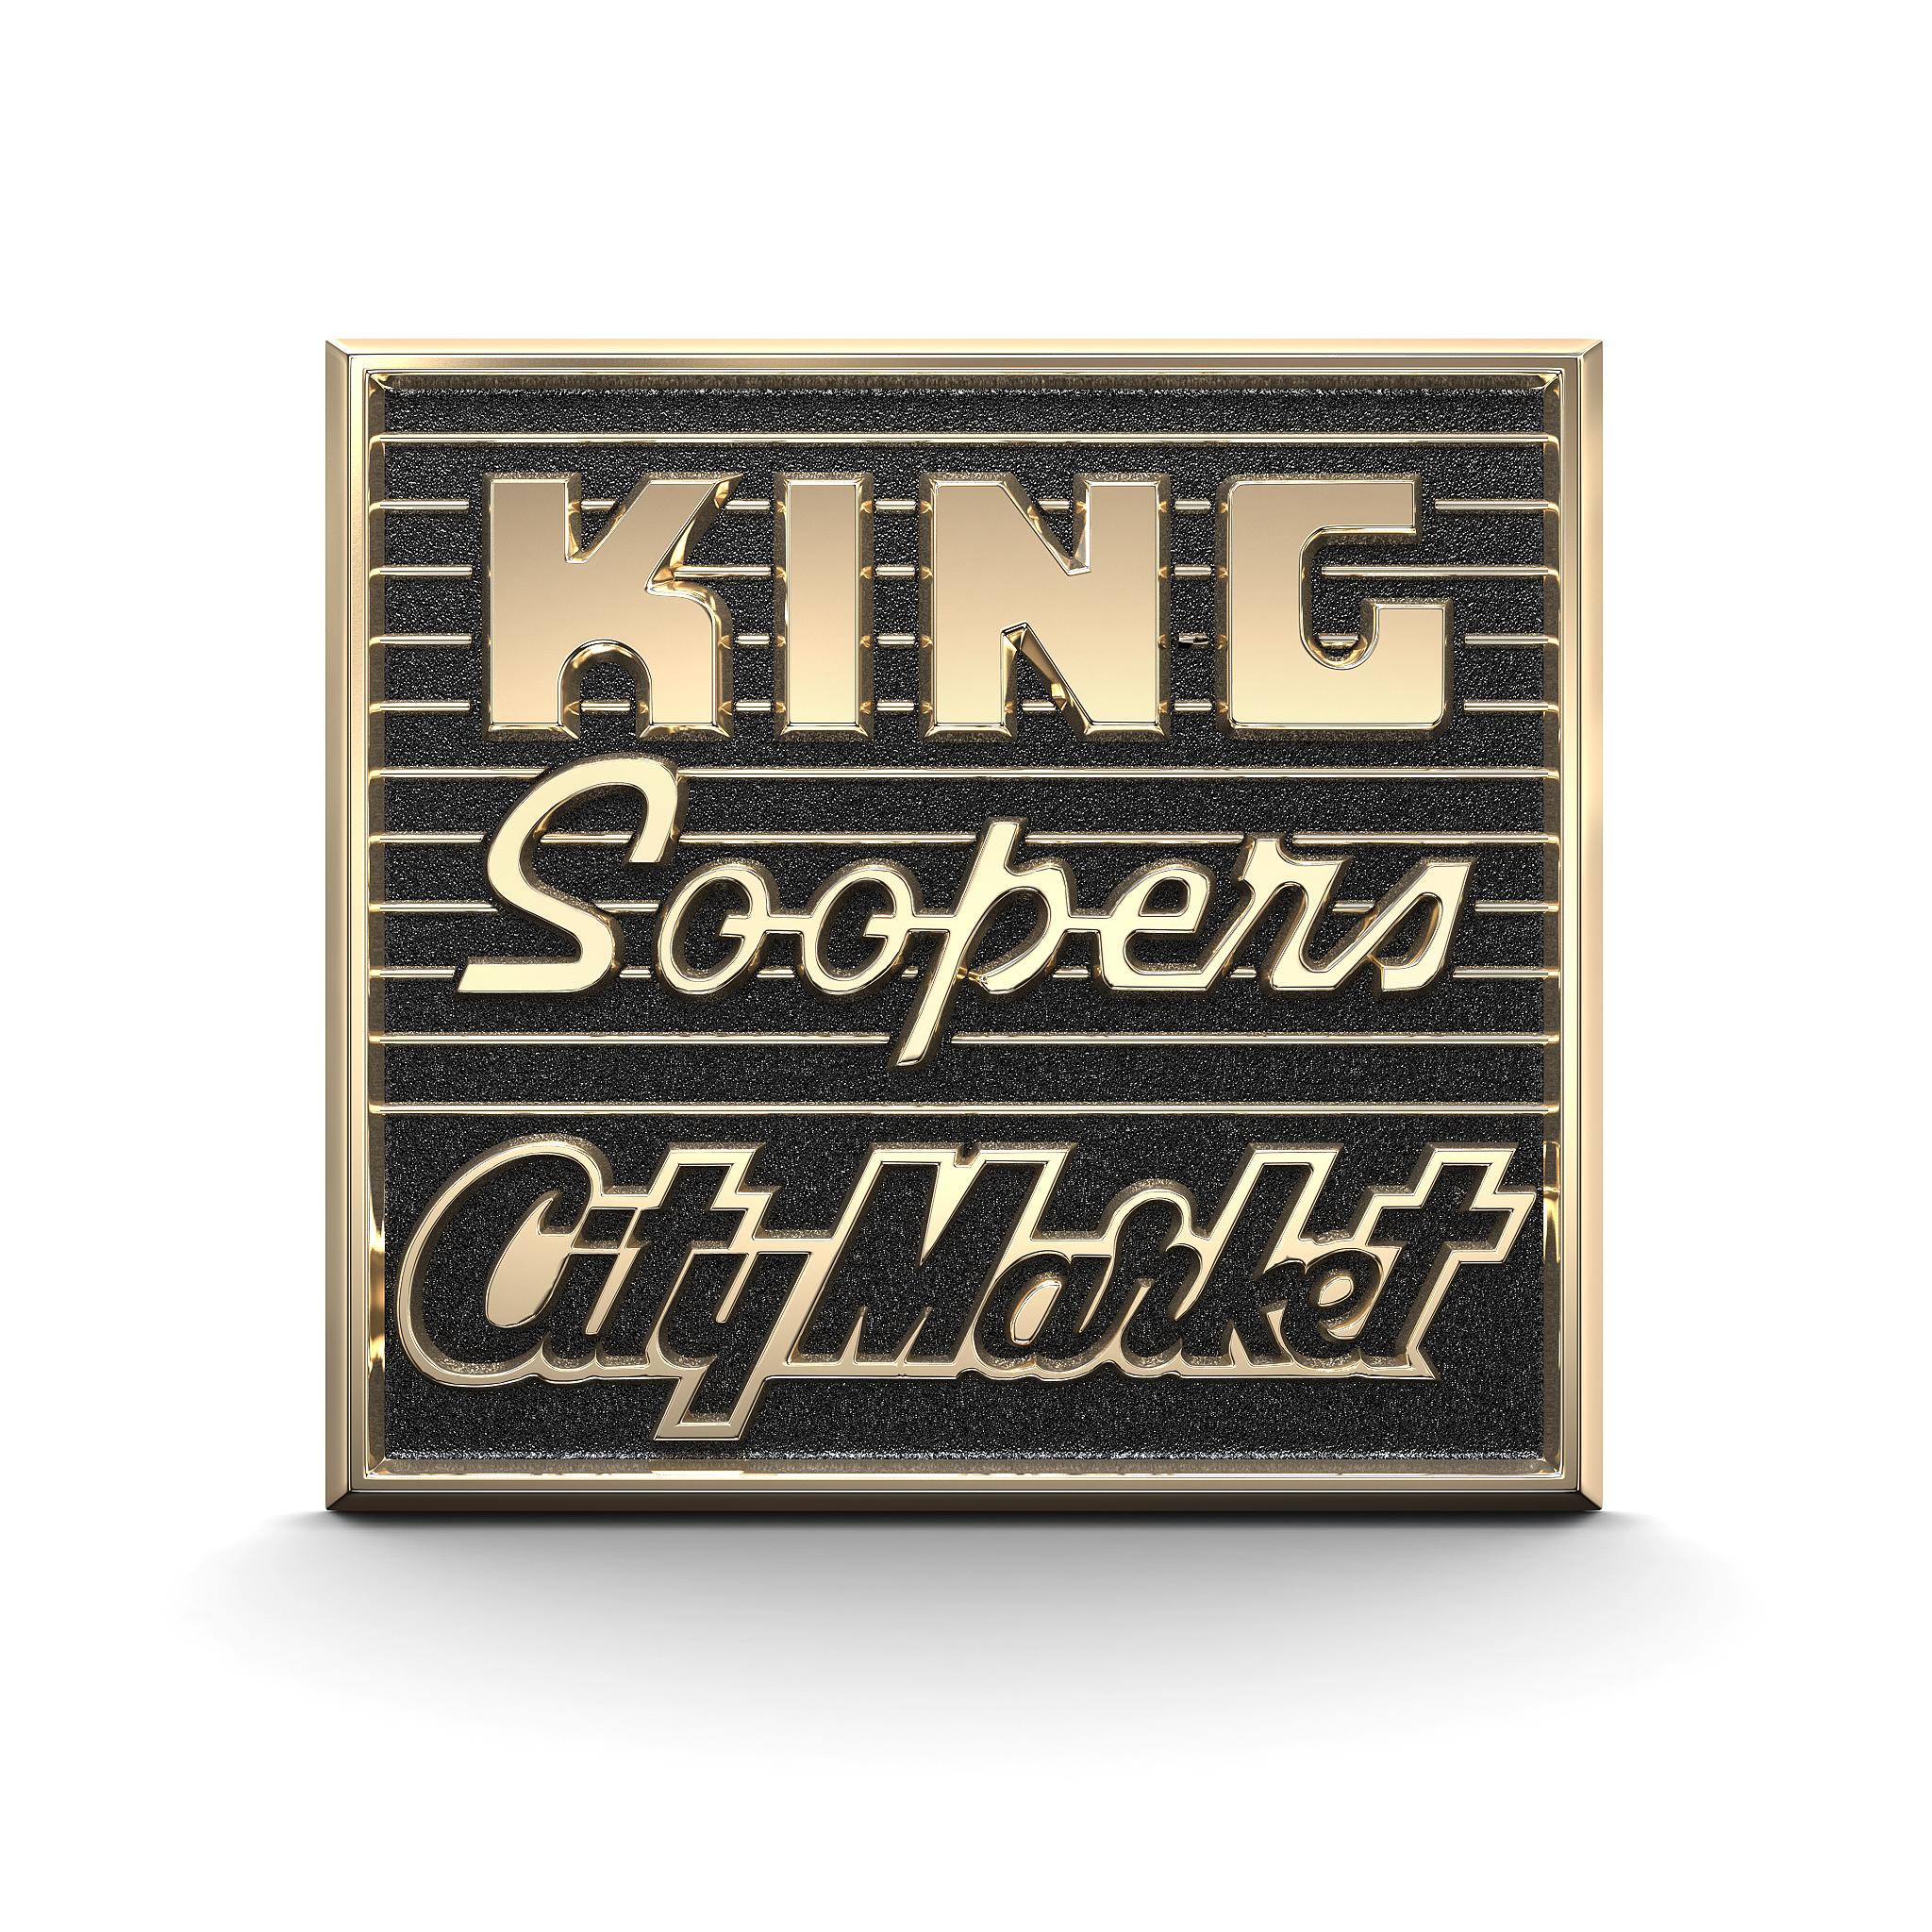 KingShoppers_CityMarket.jpg